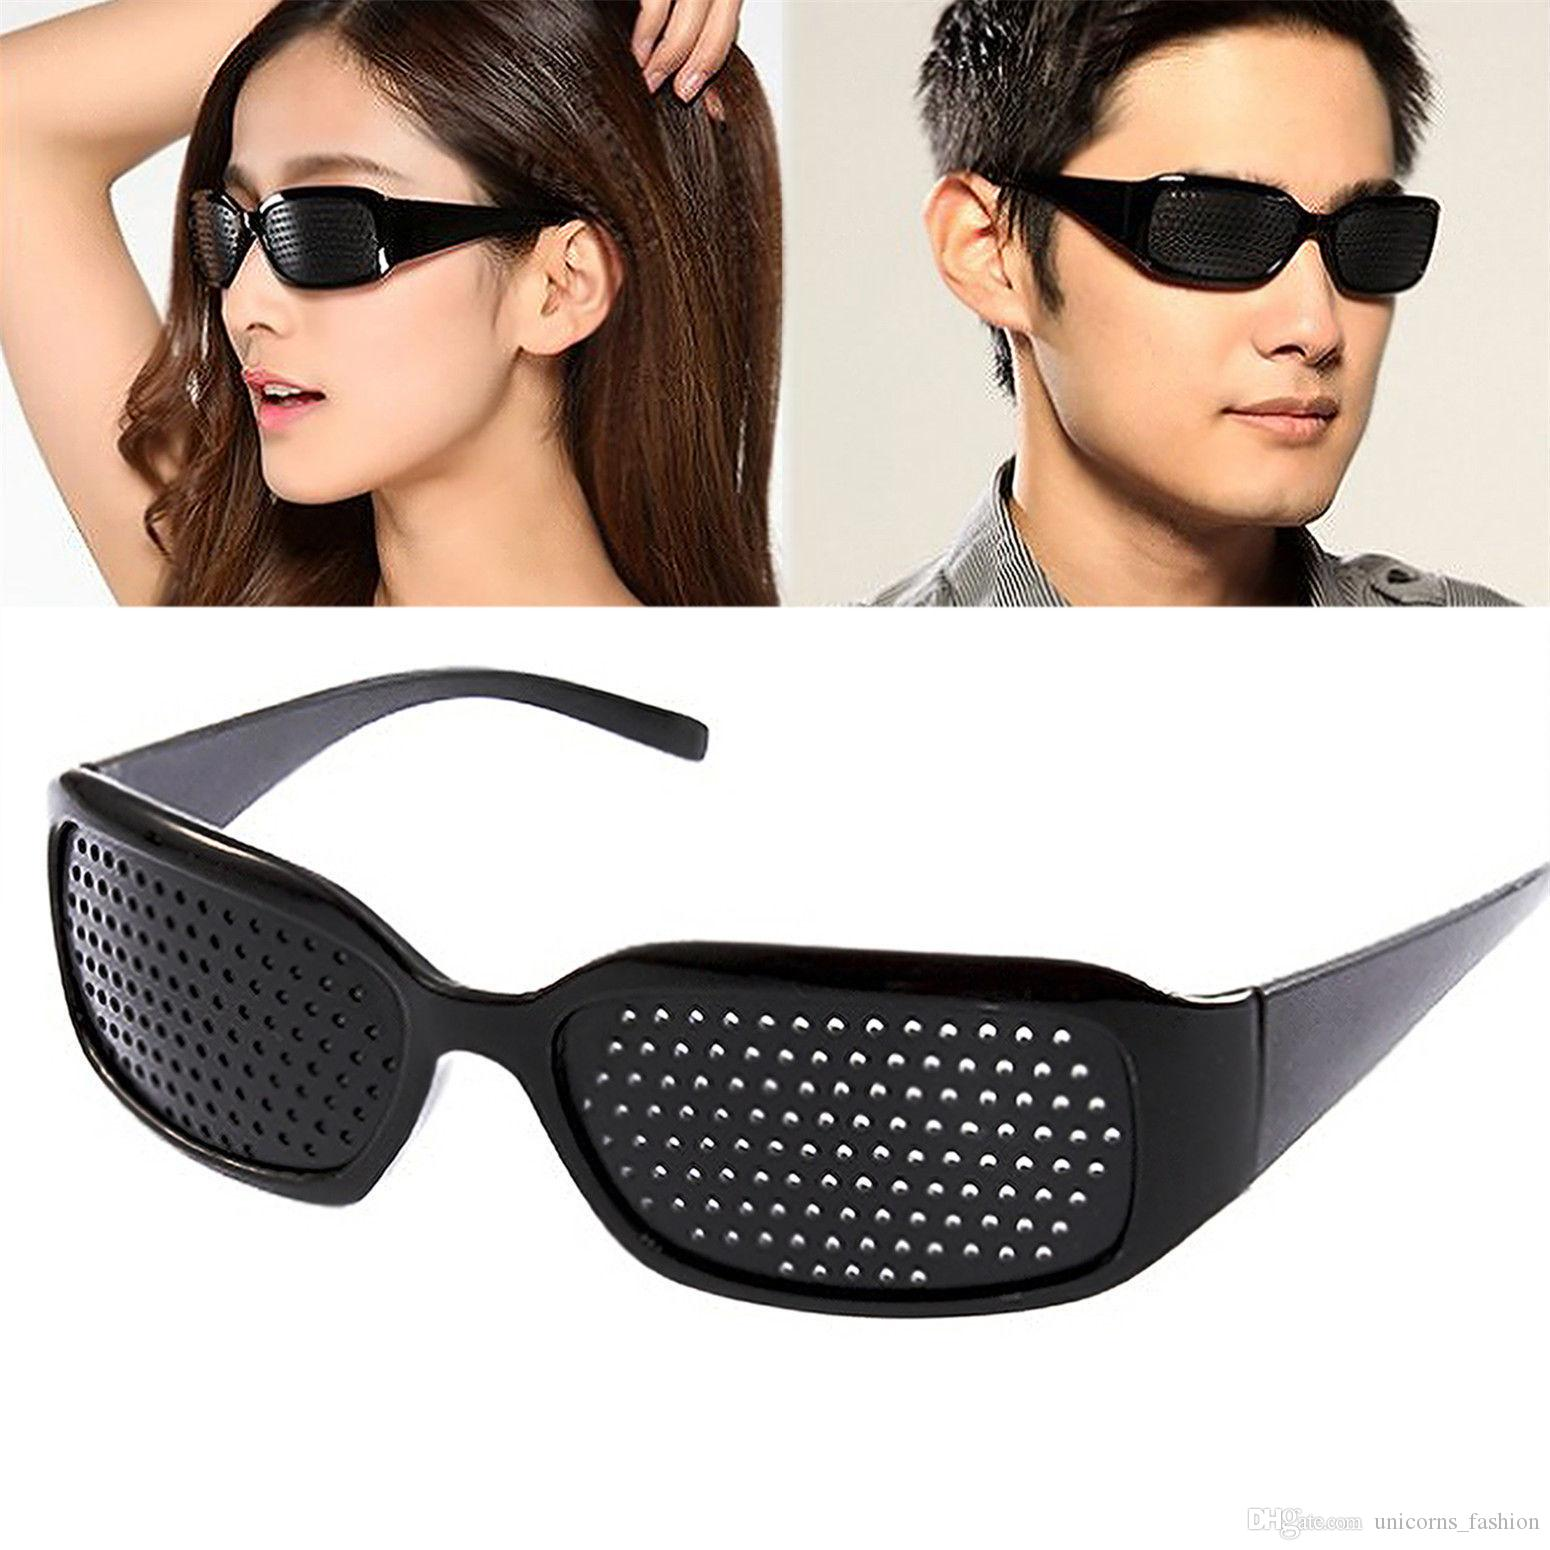 a803427356 Unisex Vision Care Pin Hole Eyeglasses Anti-fatigue Pinhole Glasses ...